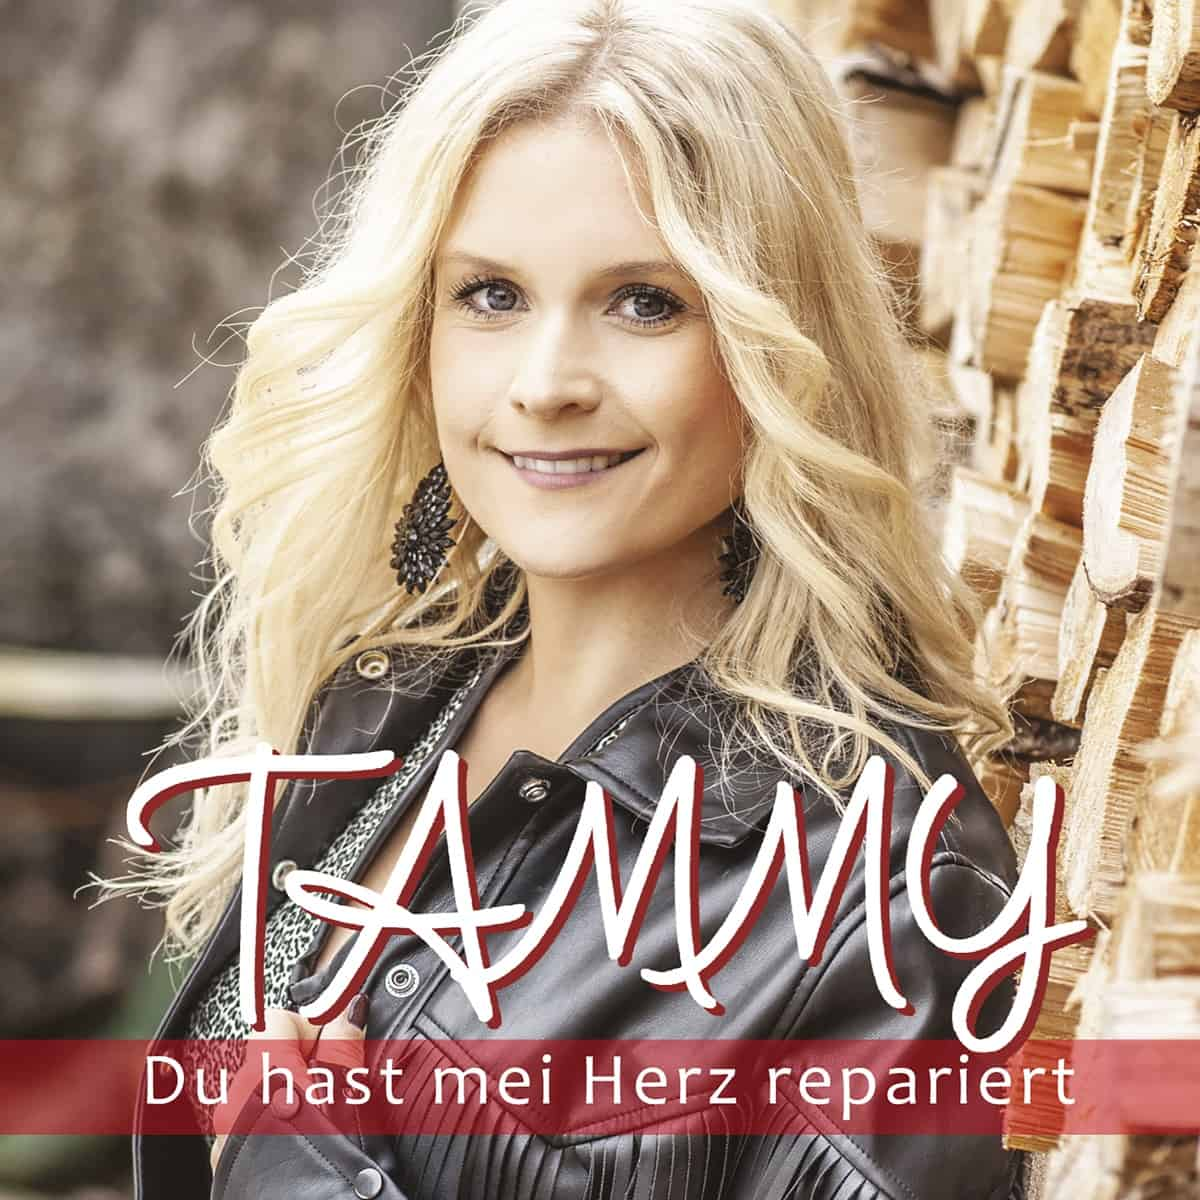 Tammy – Du hast mei Herz repariert (2020)